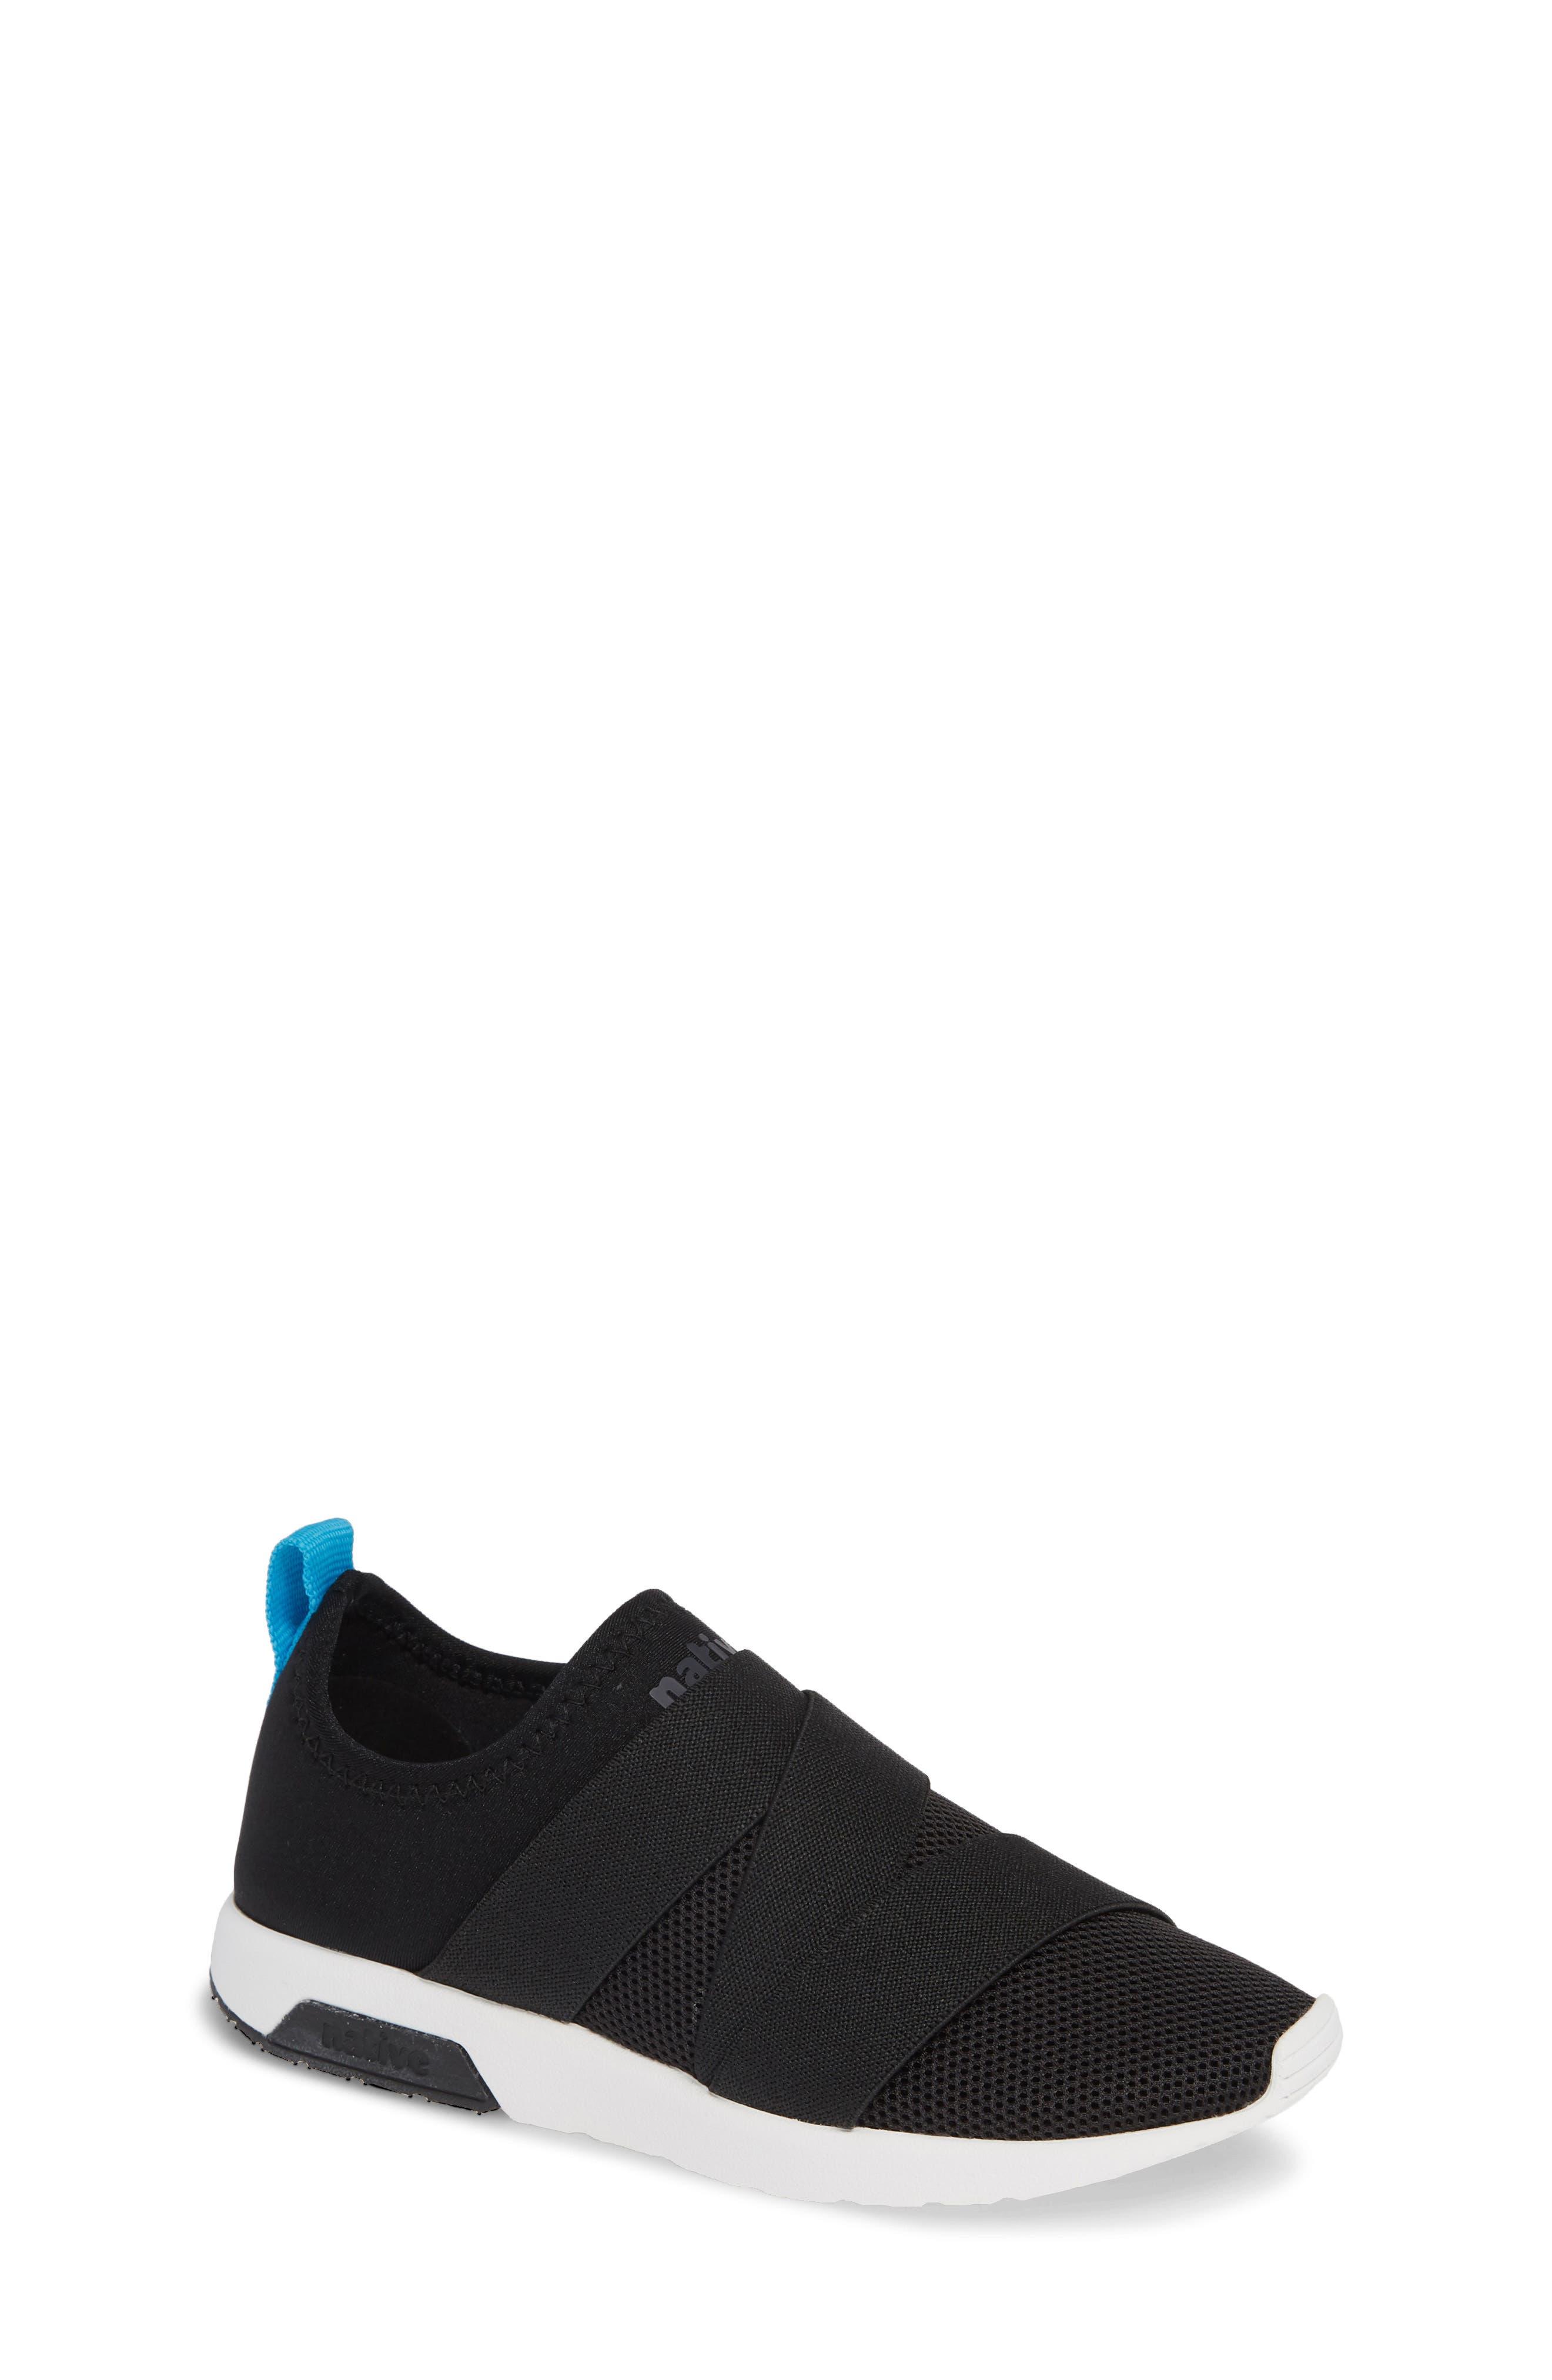 Phoenix Slip-On Sneaker,                         Main,                         color, JIFFY BLACK/ SHELL WHITE